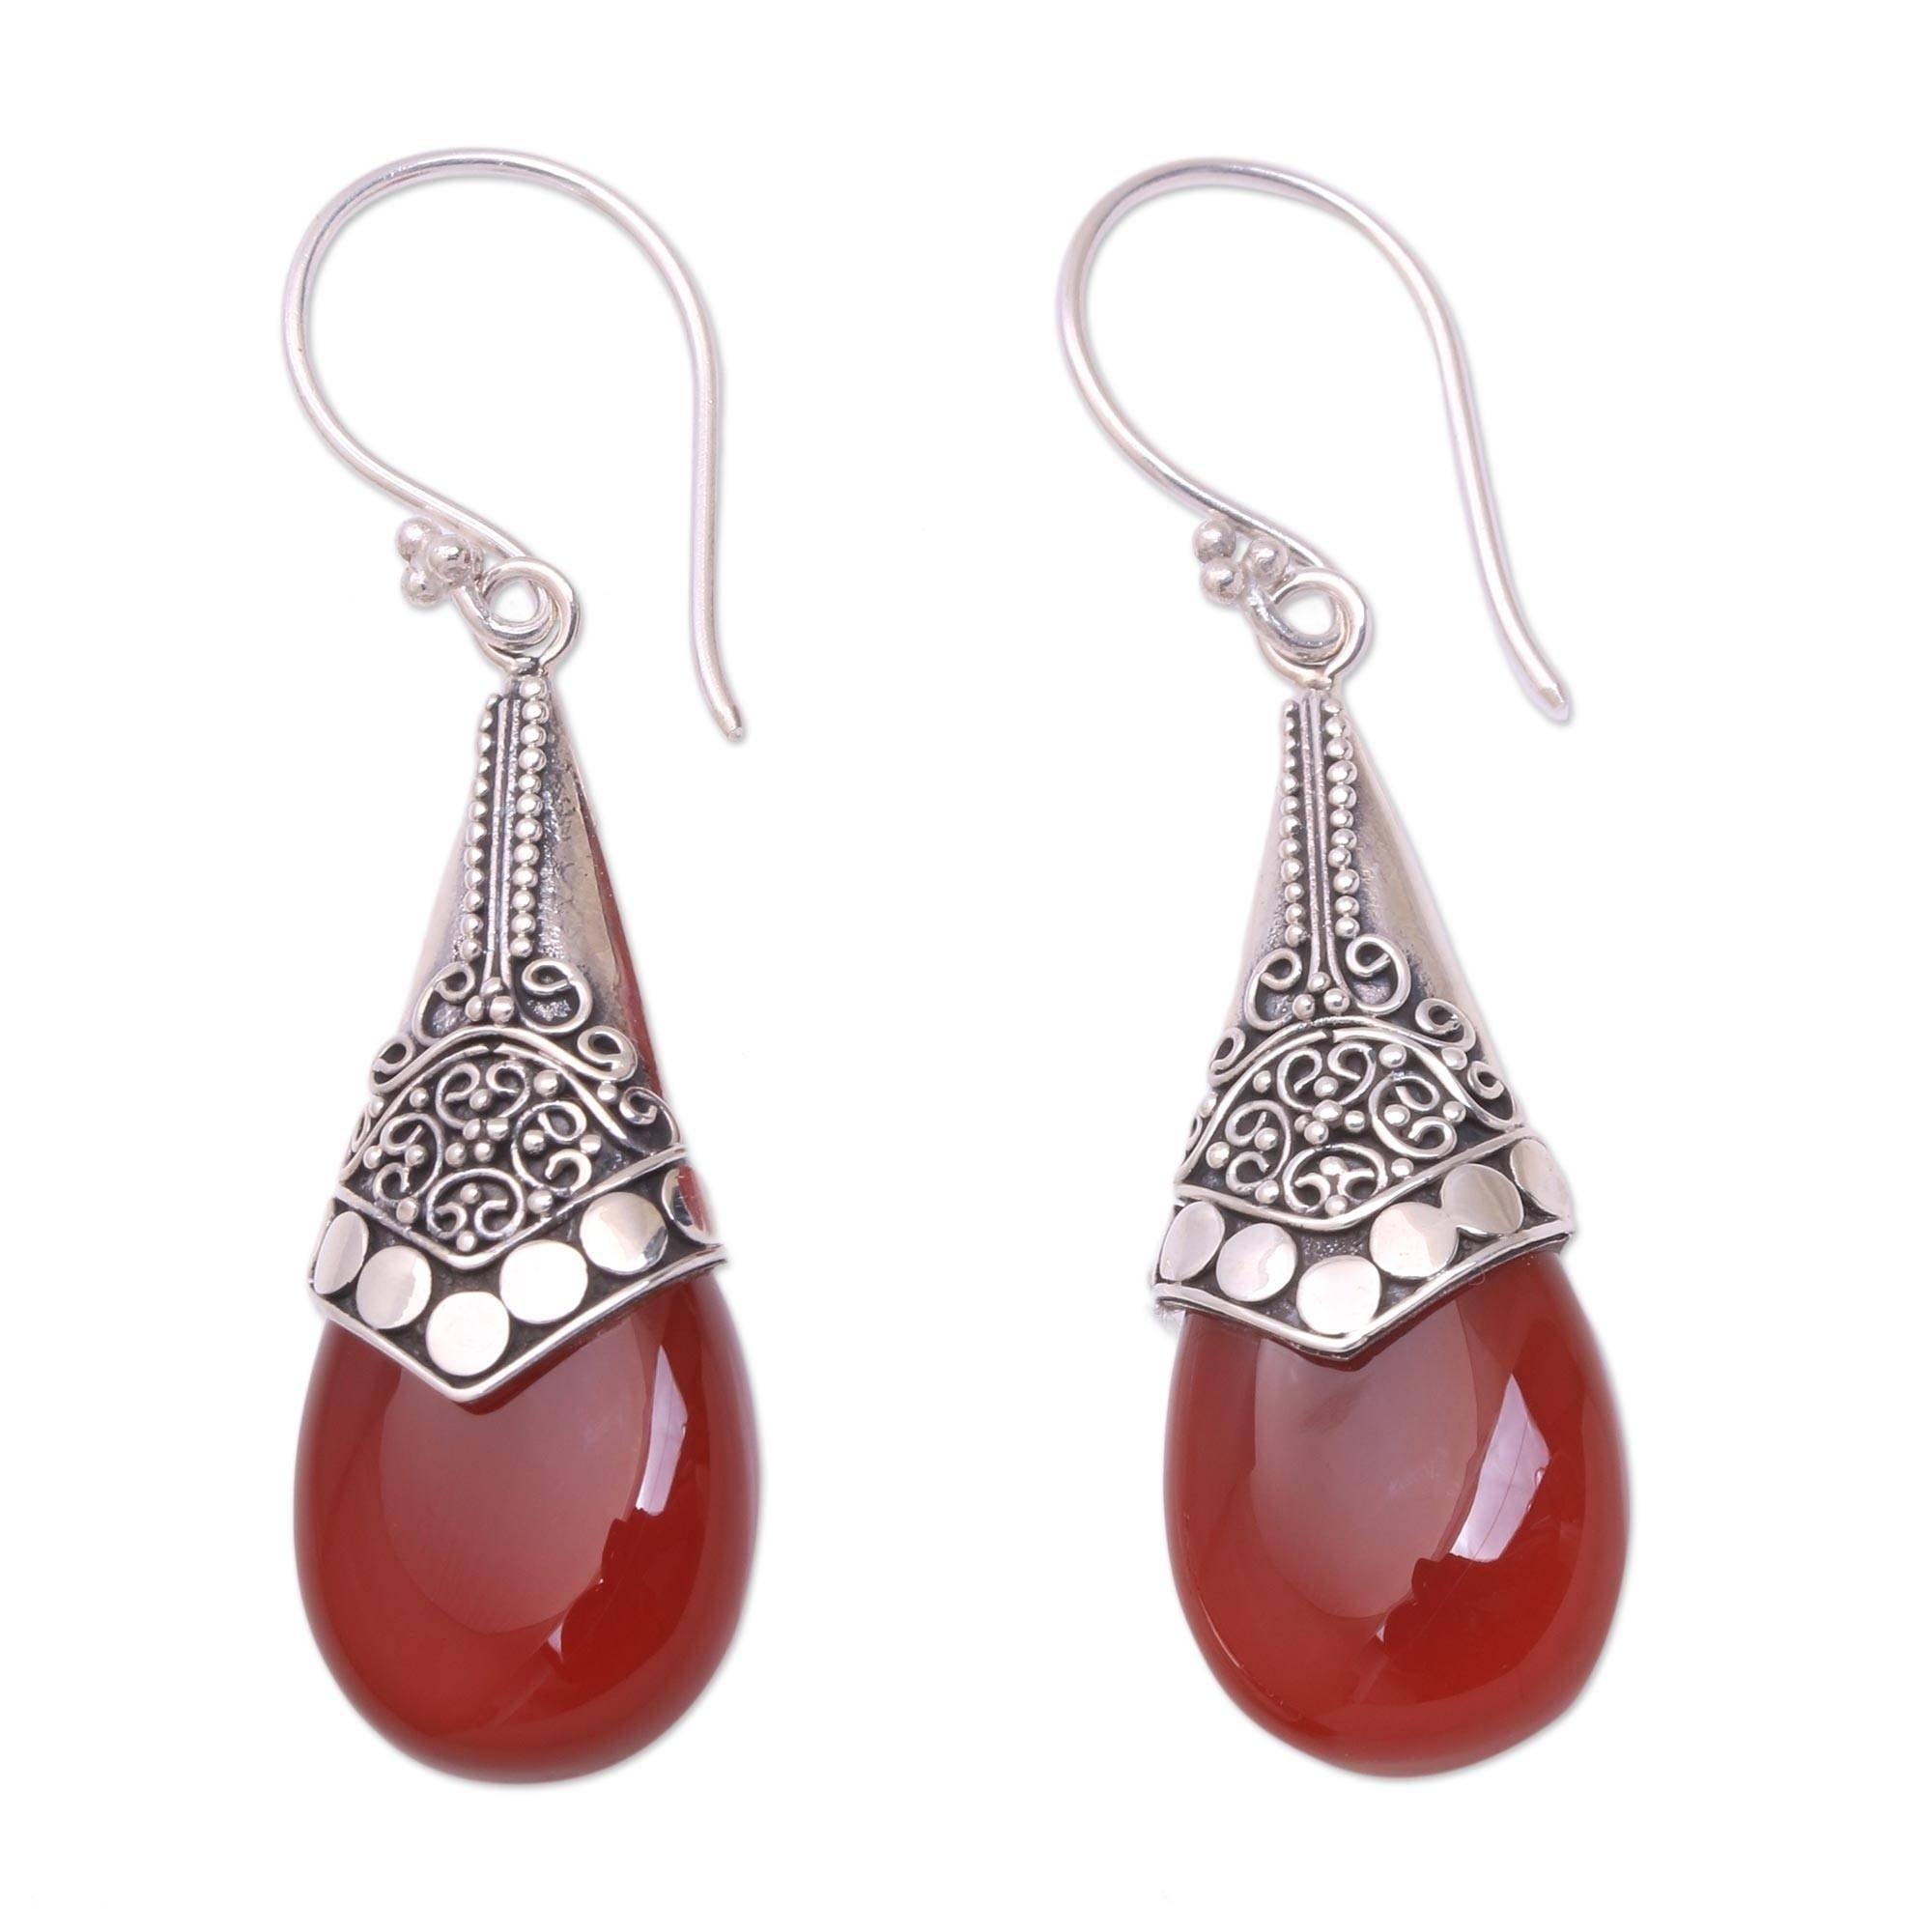 Red Garnet Cone Shaped Sterling Silver Earrings